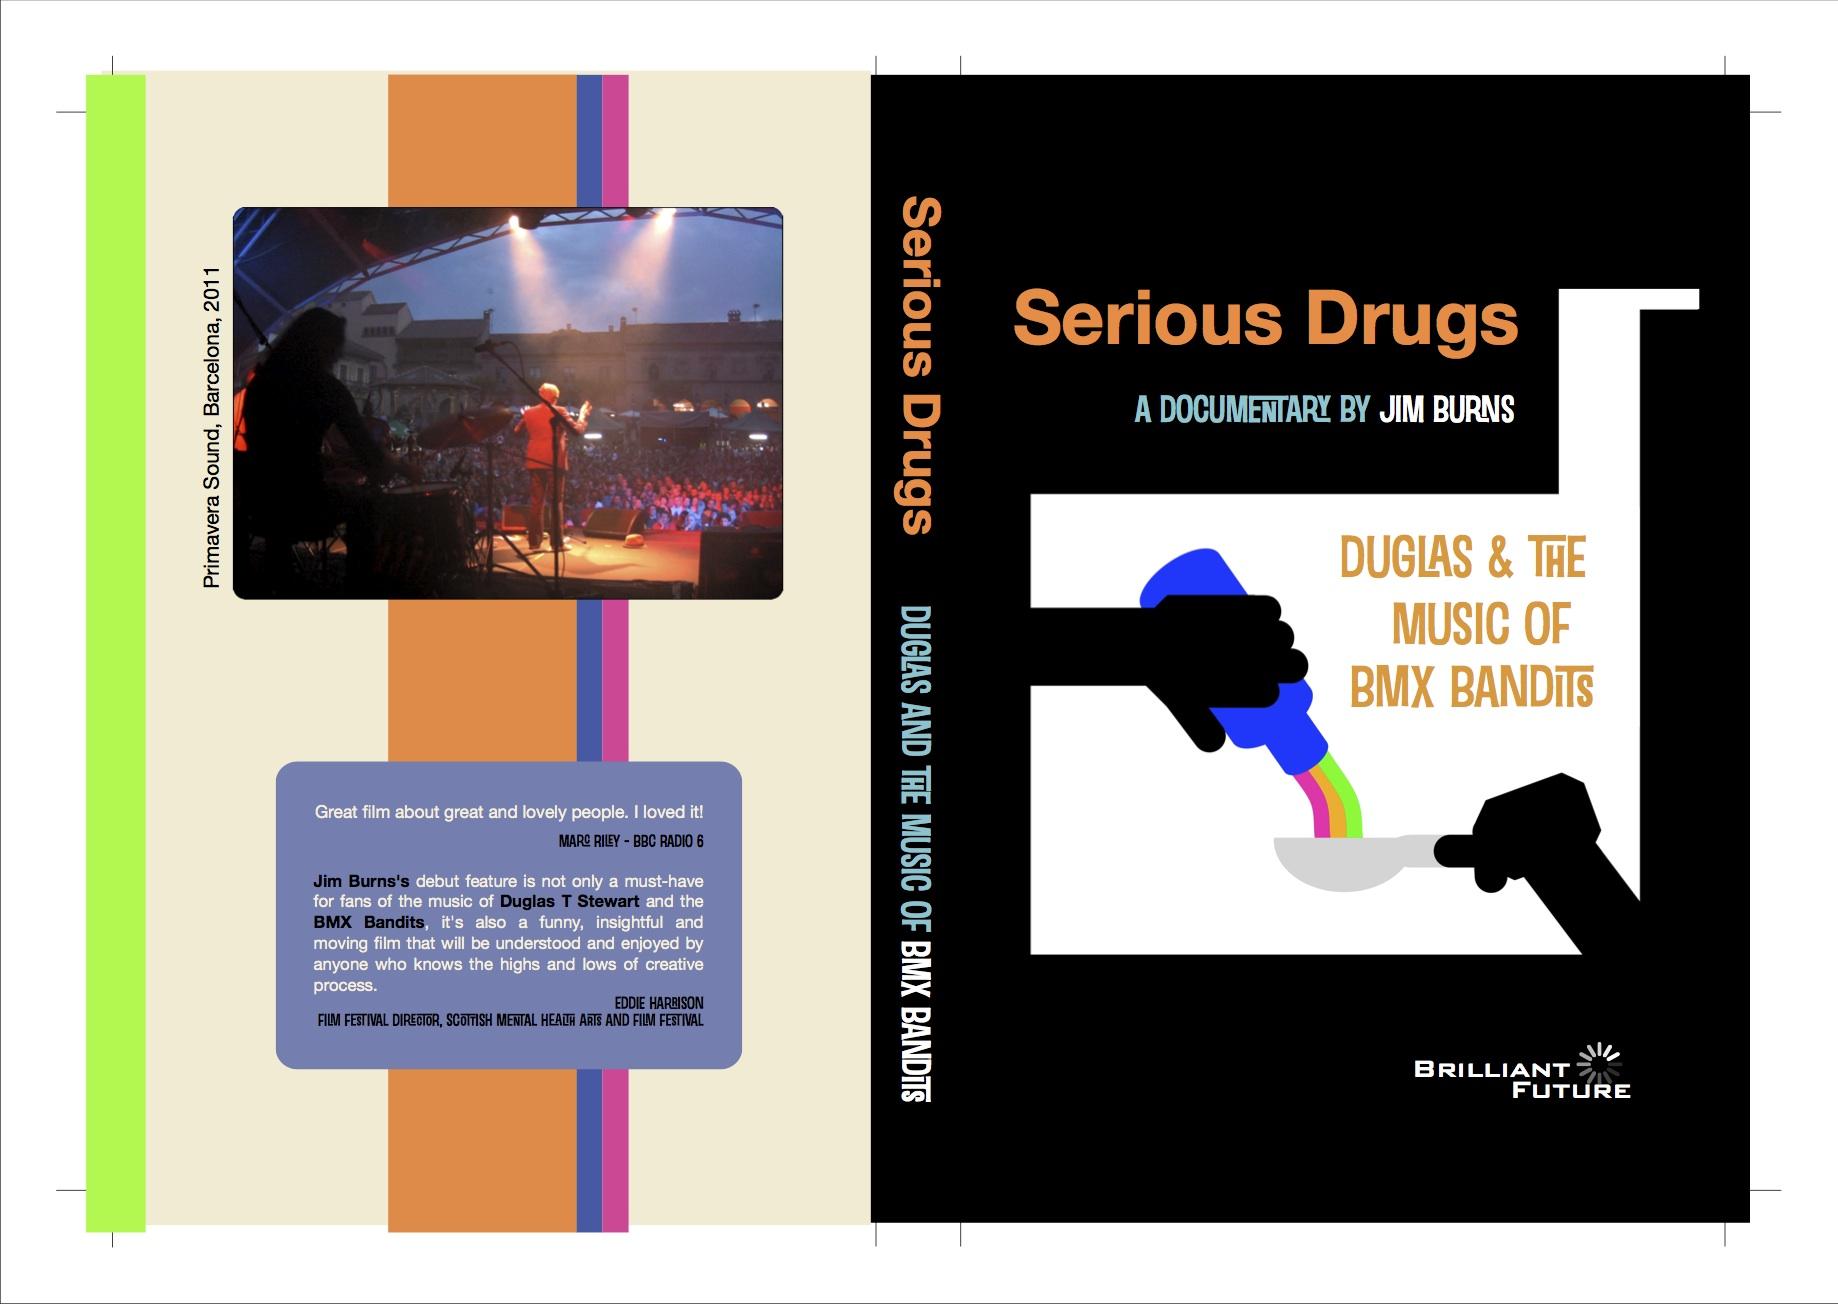 DVDB101_out-5 copy